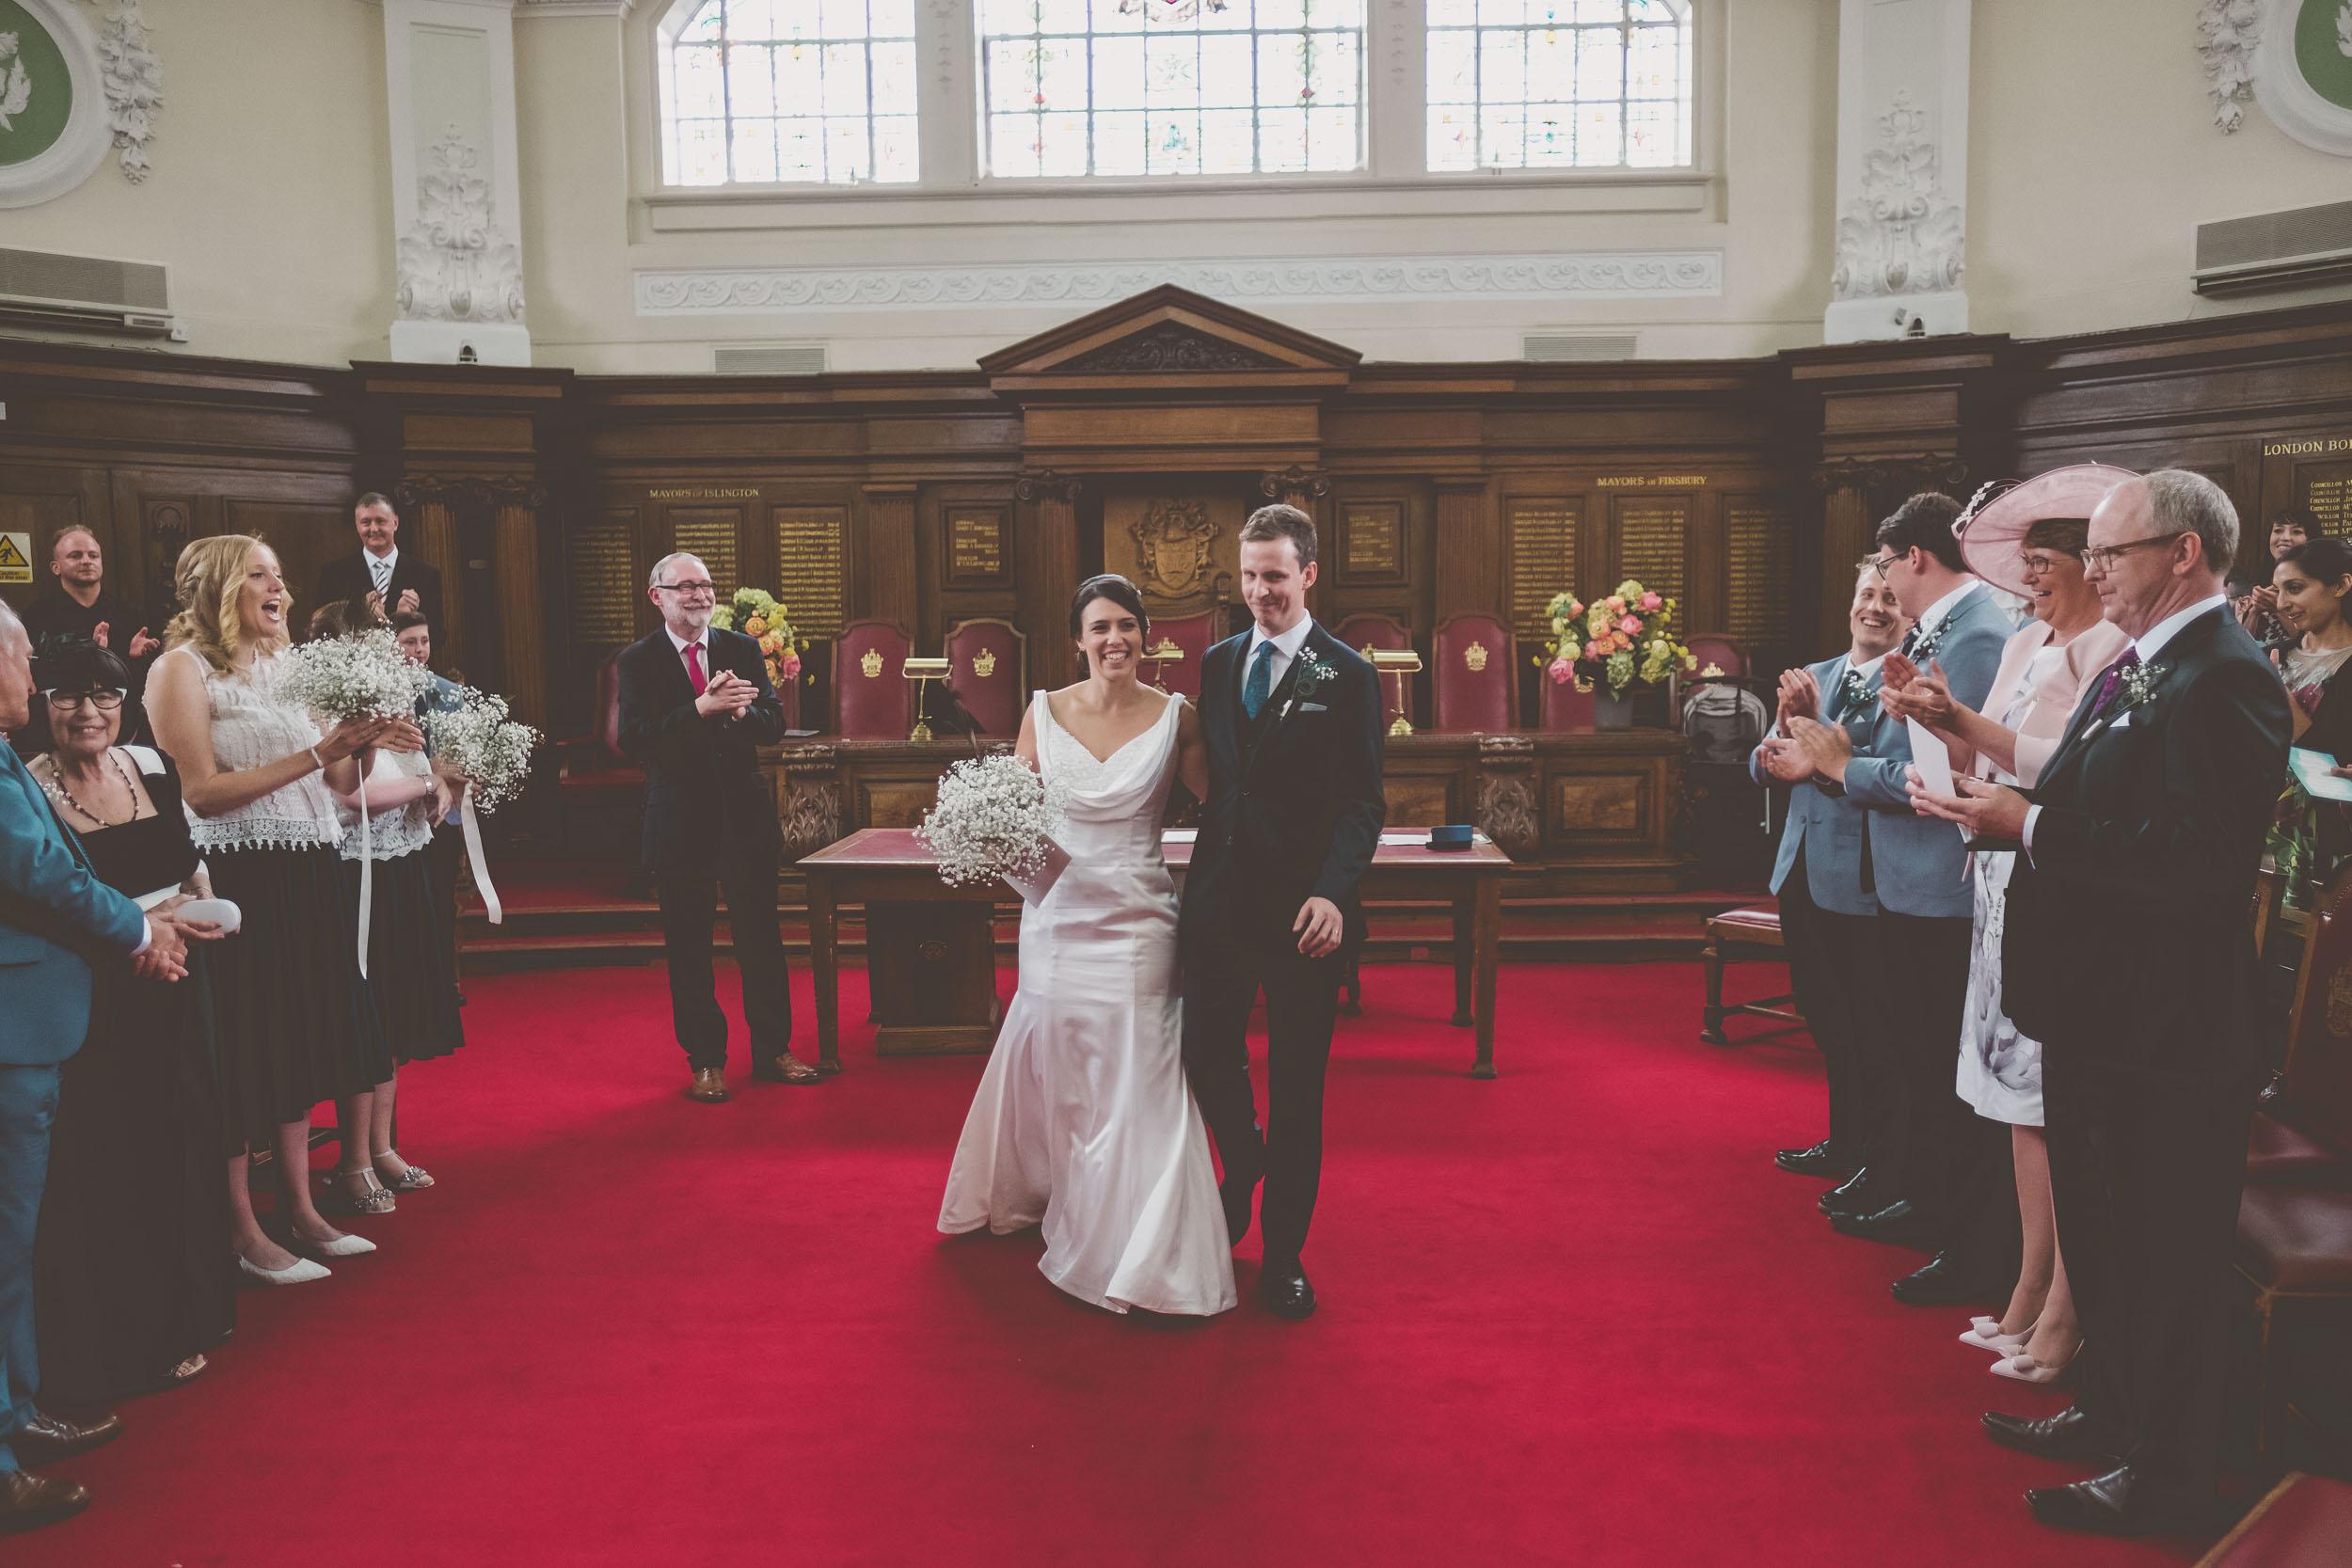 islington-town-hall-4th-floor-studios-wedding123.jpg